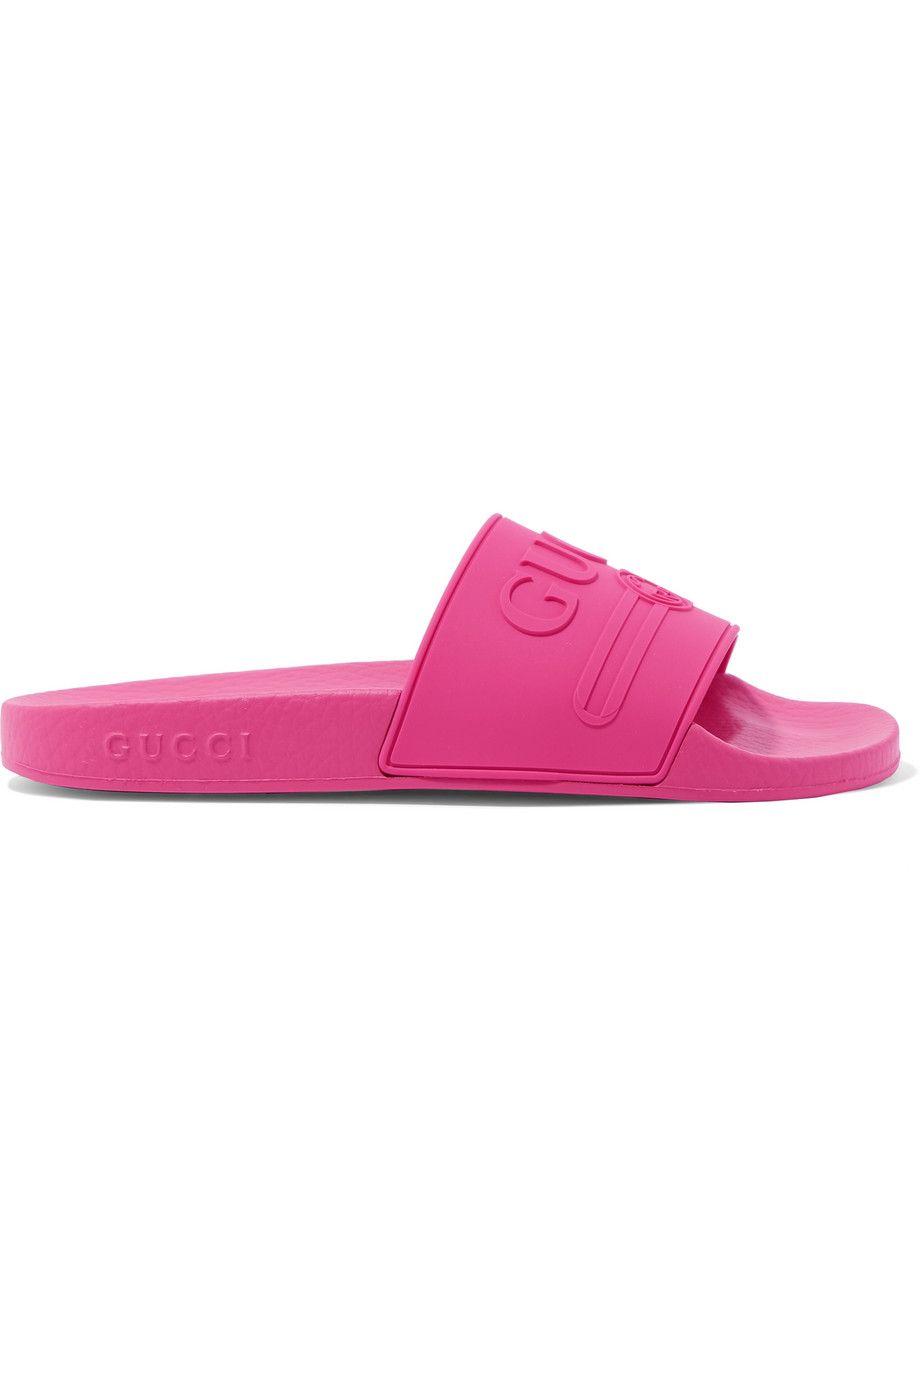 #PopbelaOOTD: Sandal Musim Panas yang Fun